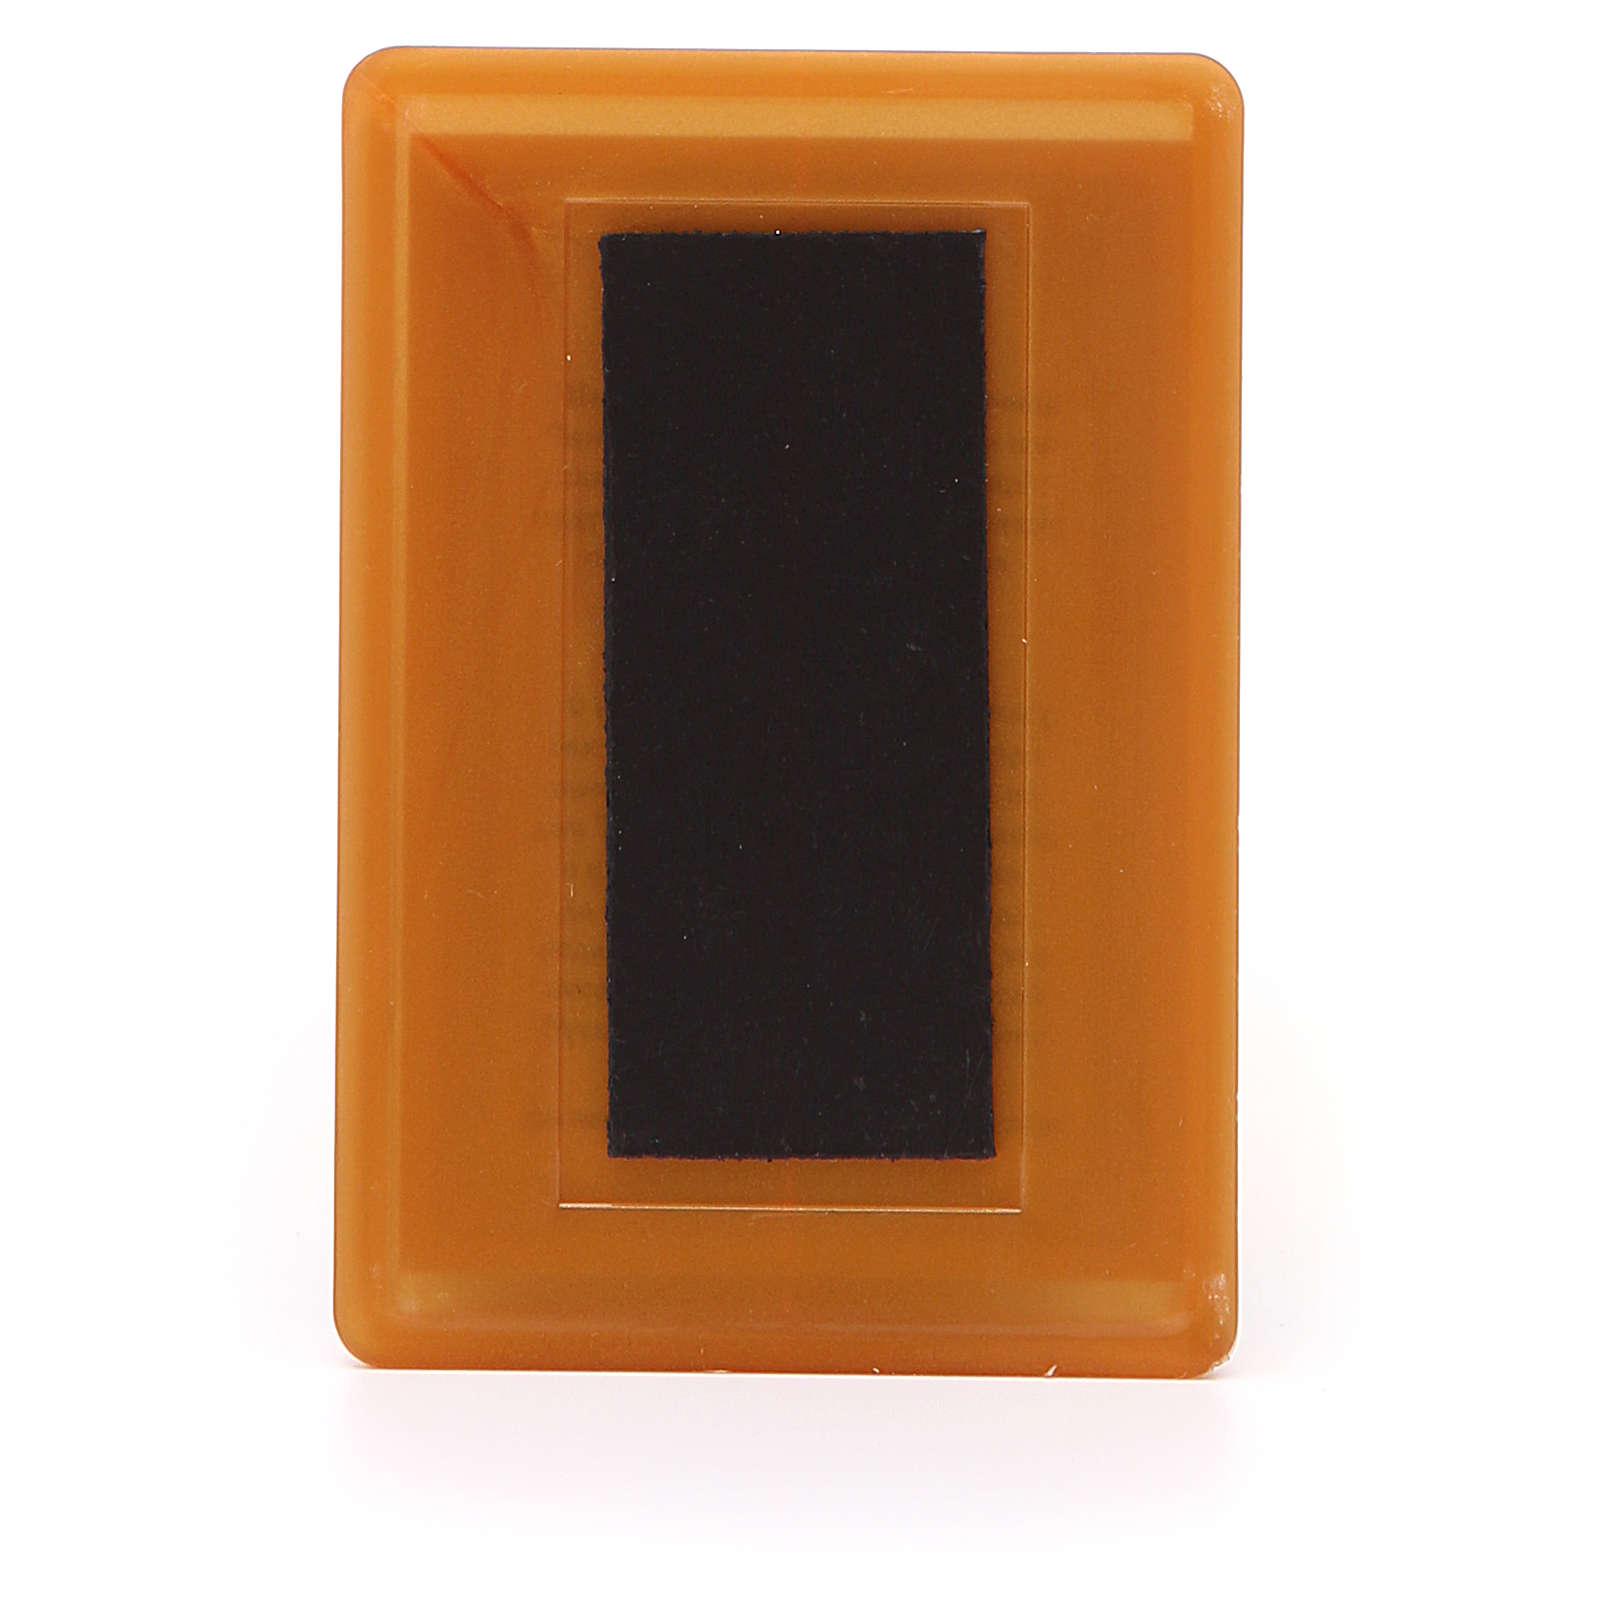 Magnet plexiglass russian Chenstohovskaya 10x7cm 3